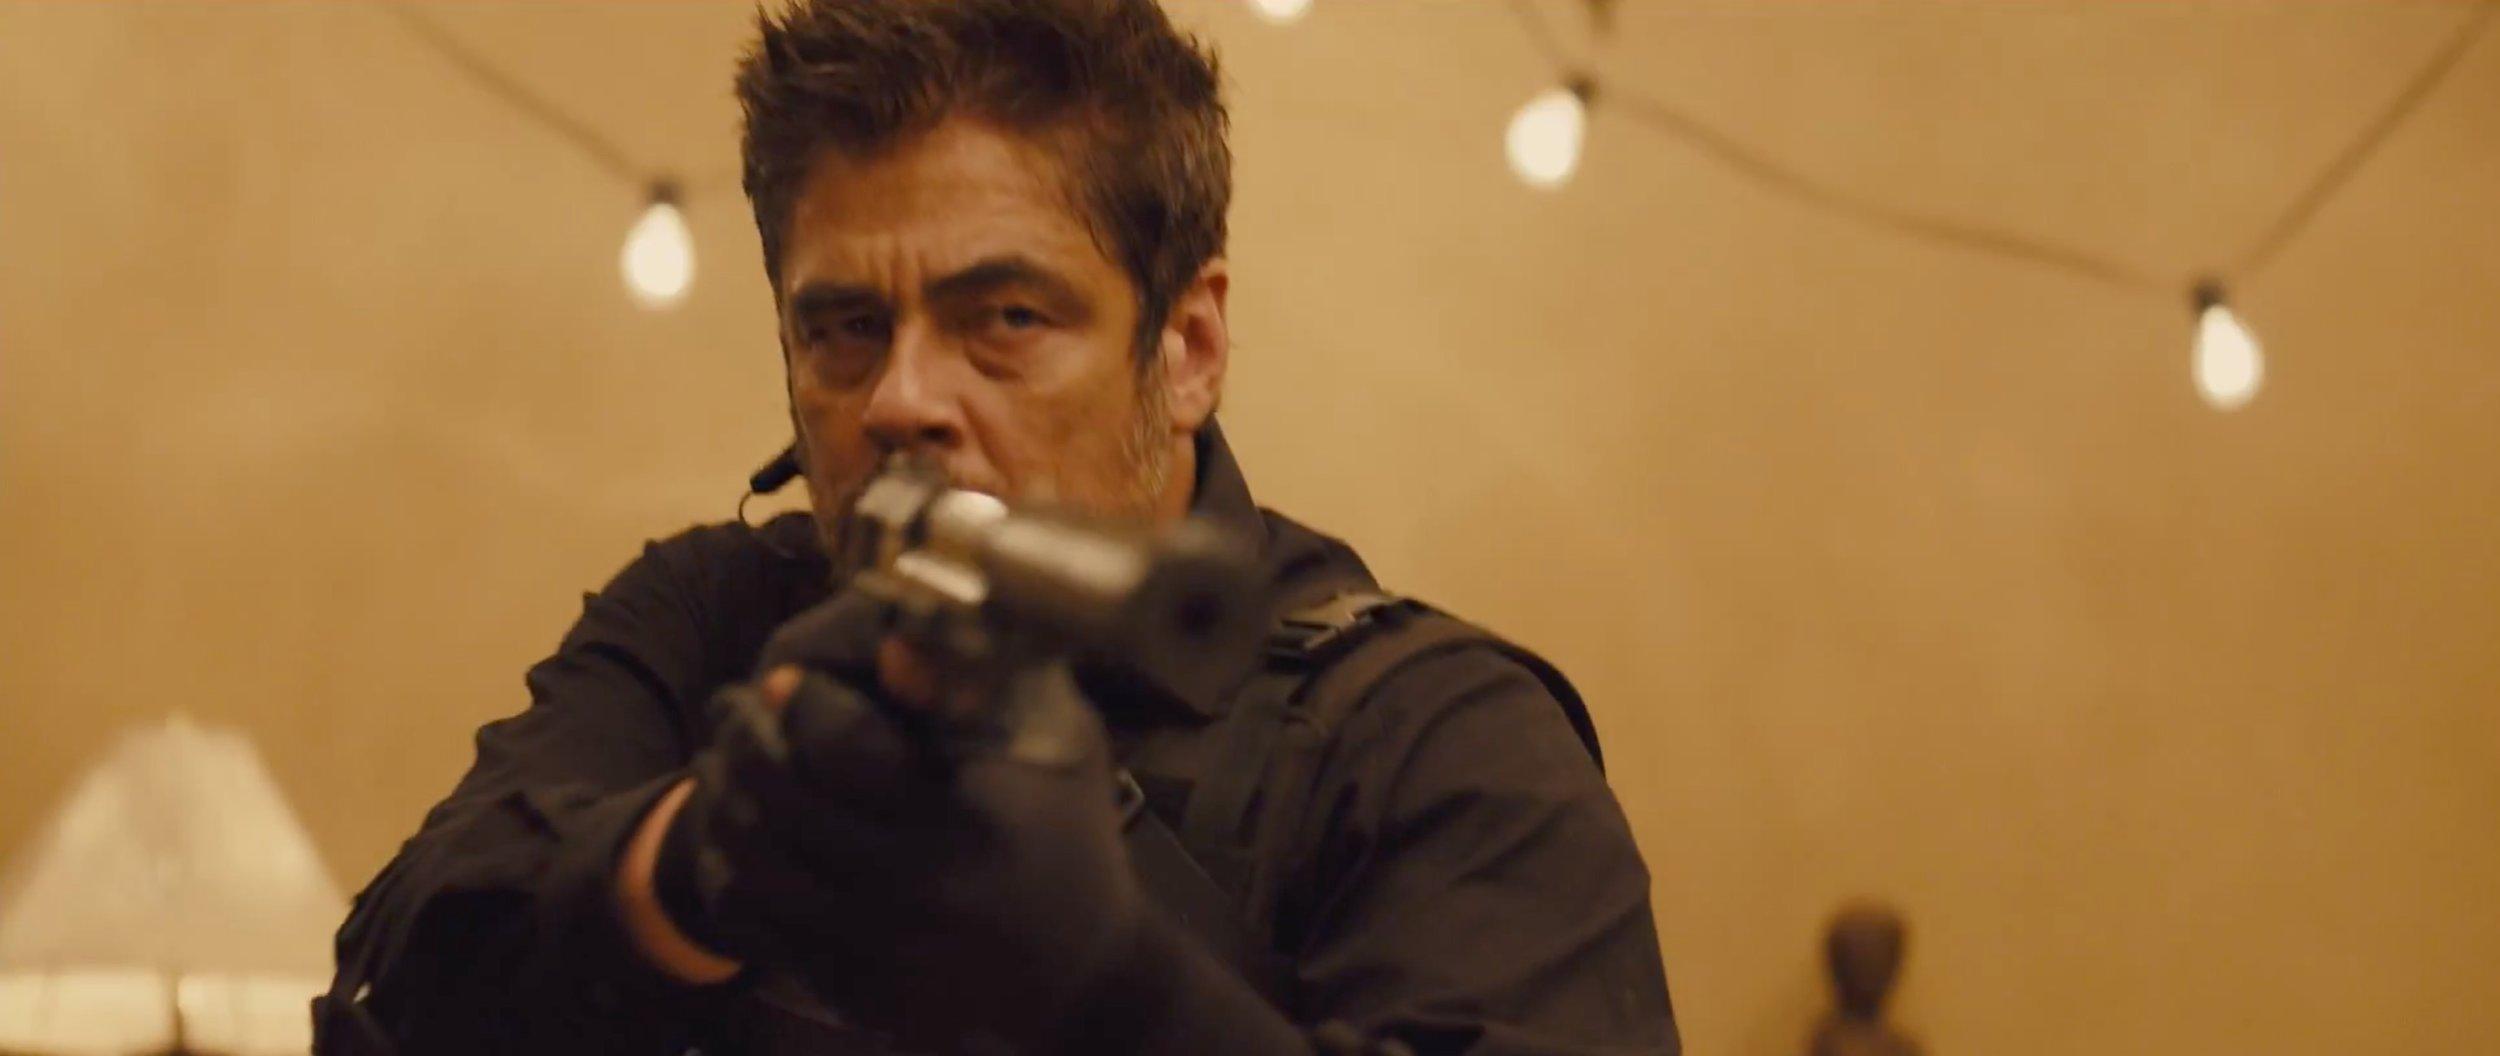 Sicarioi_Benicio.jpg